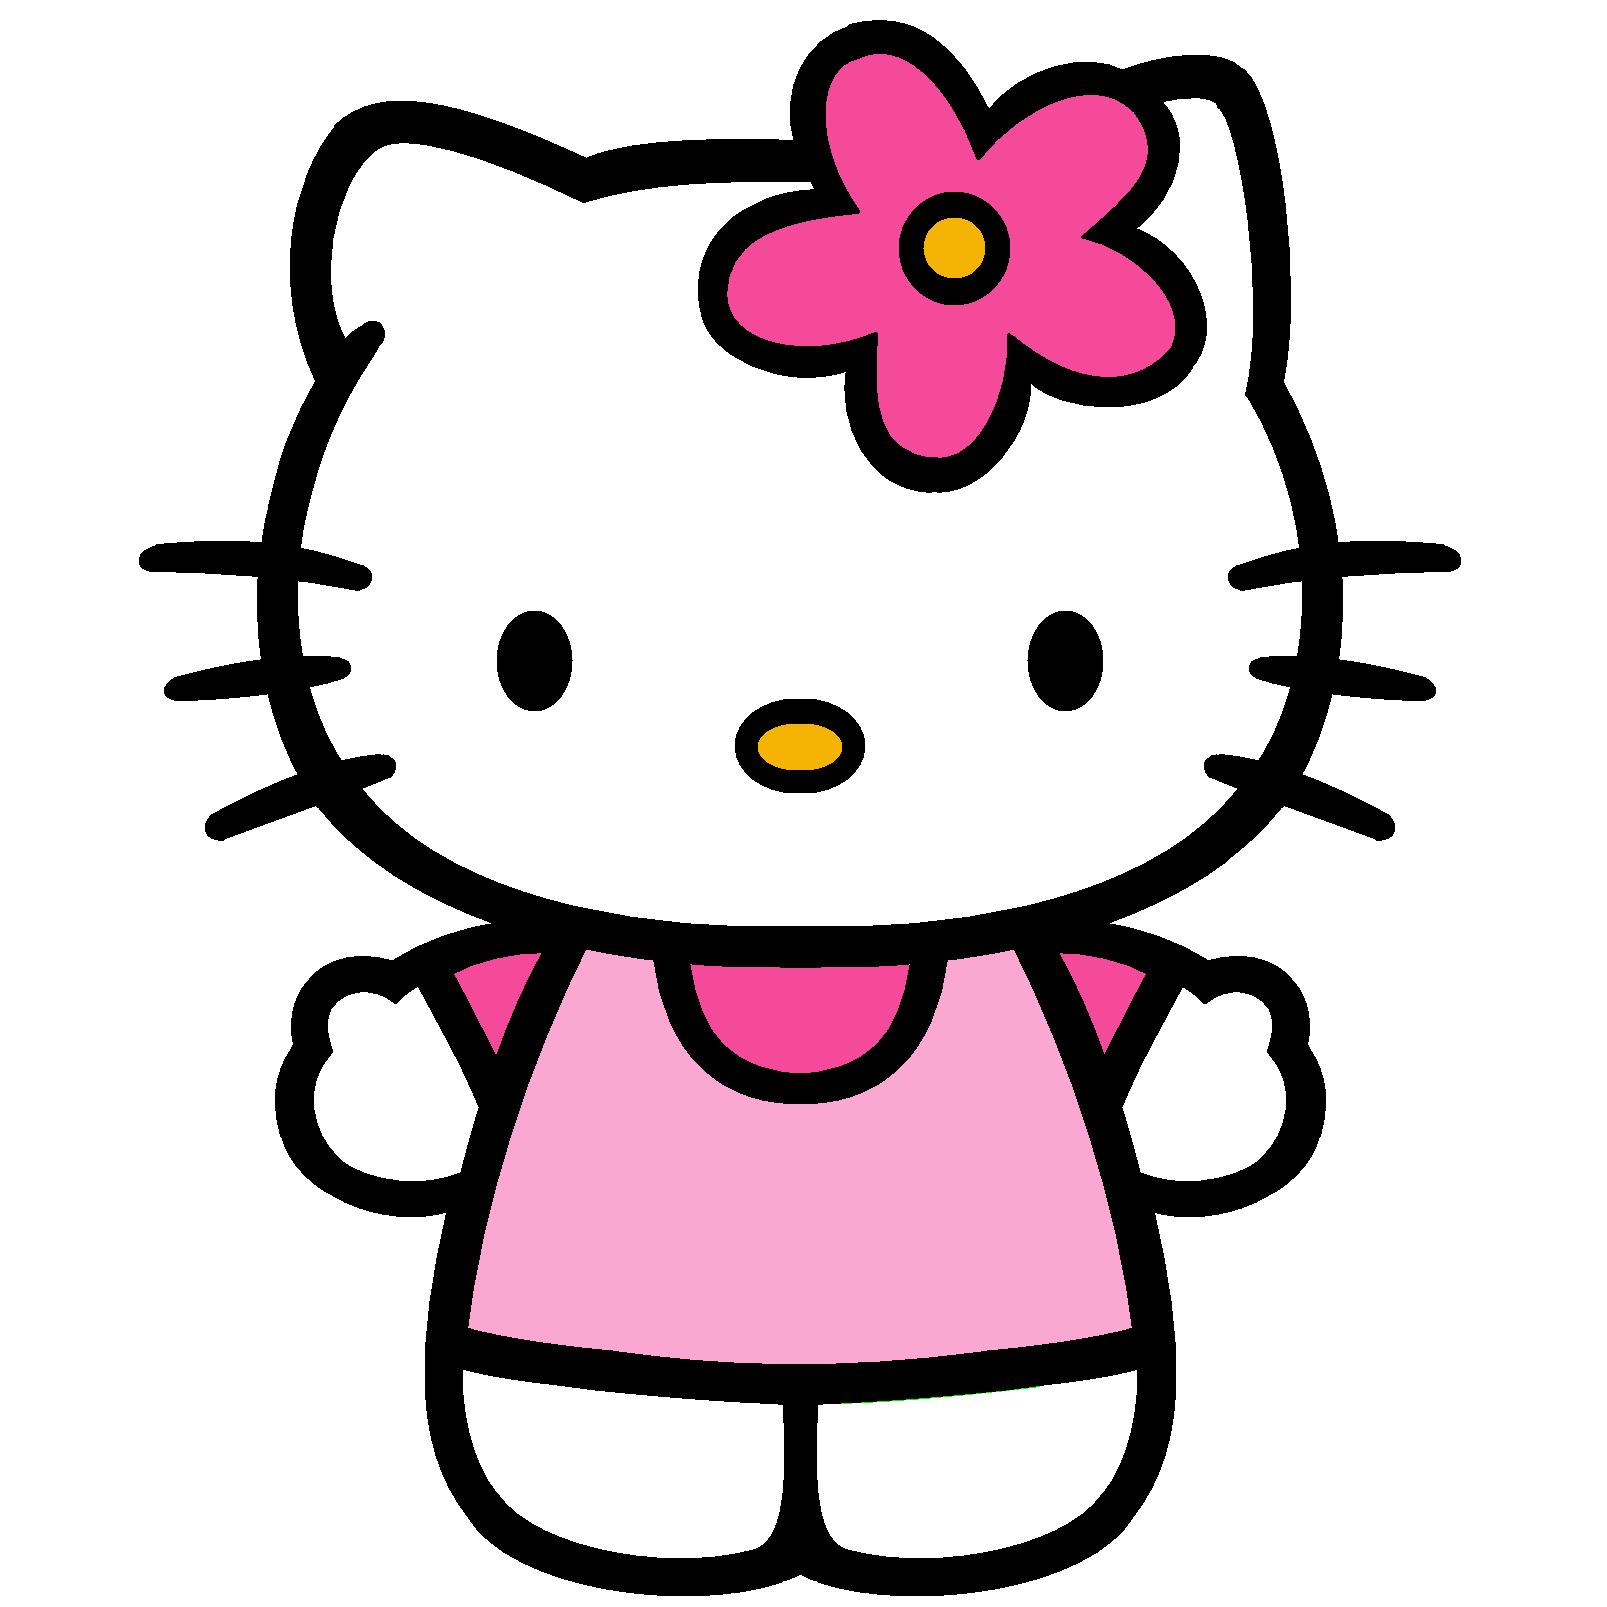 Free Hello Kitty Wall Stencils, Download Free Clip Art, Free Clip - Free Printable Hello Kitty Pictures